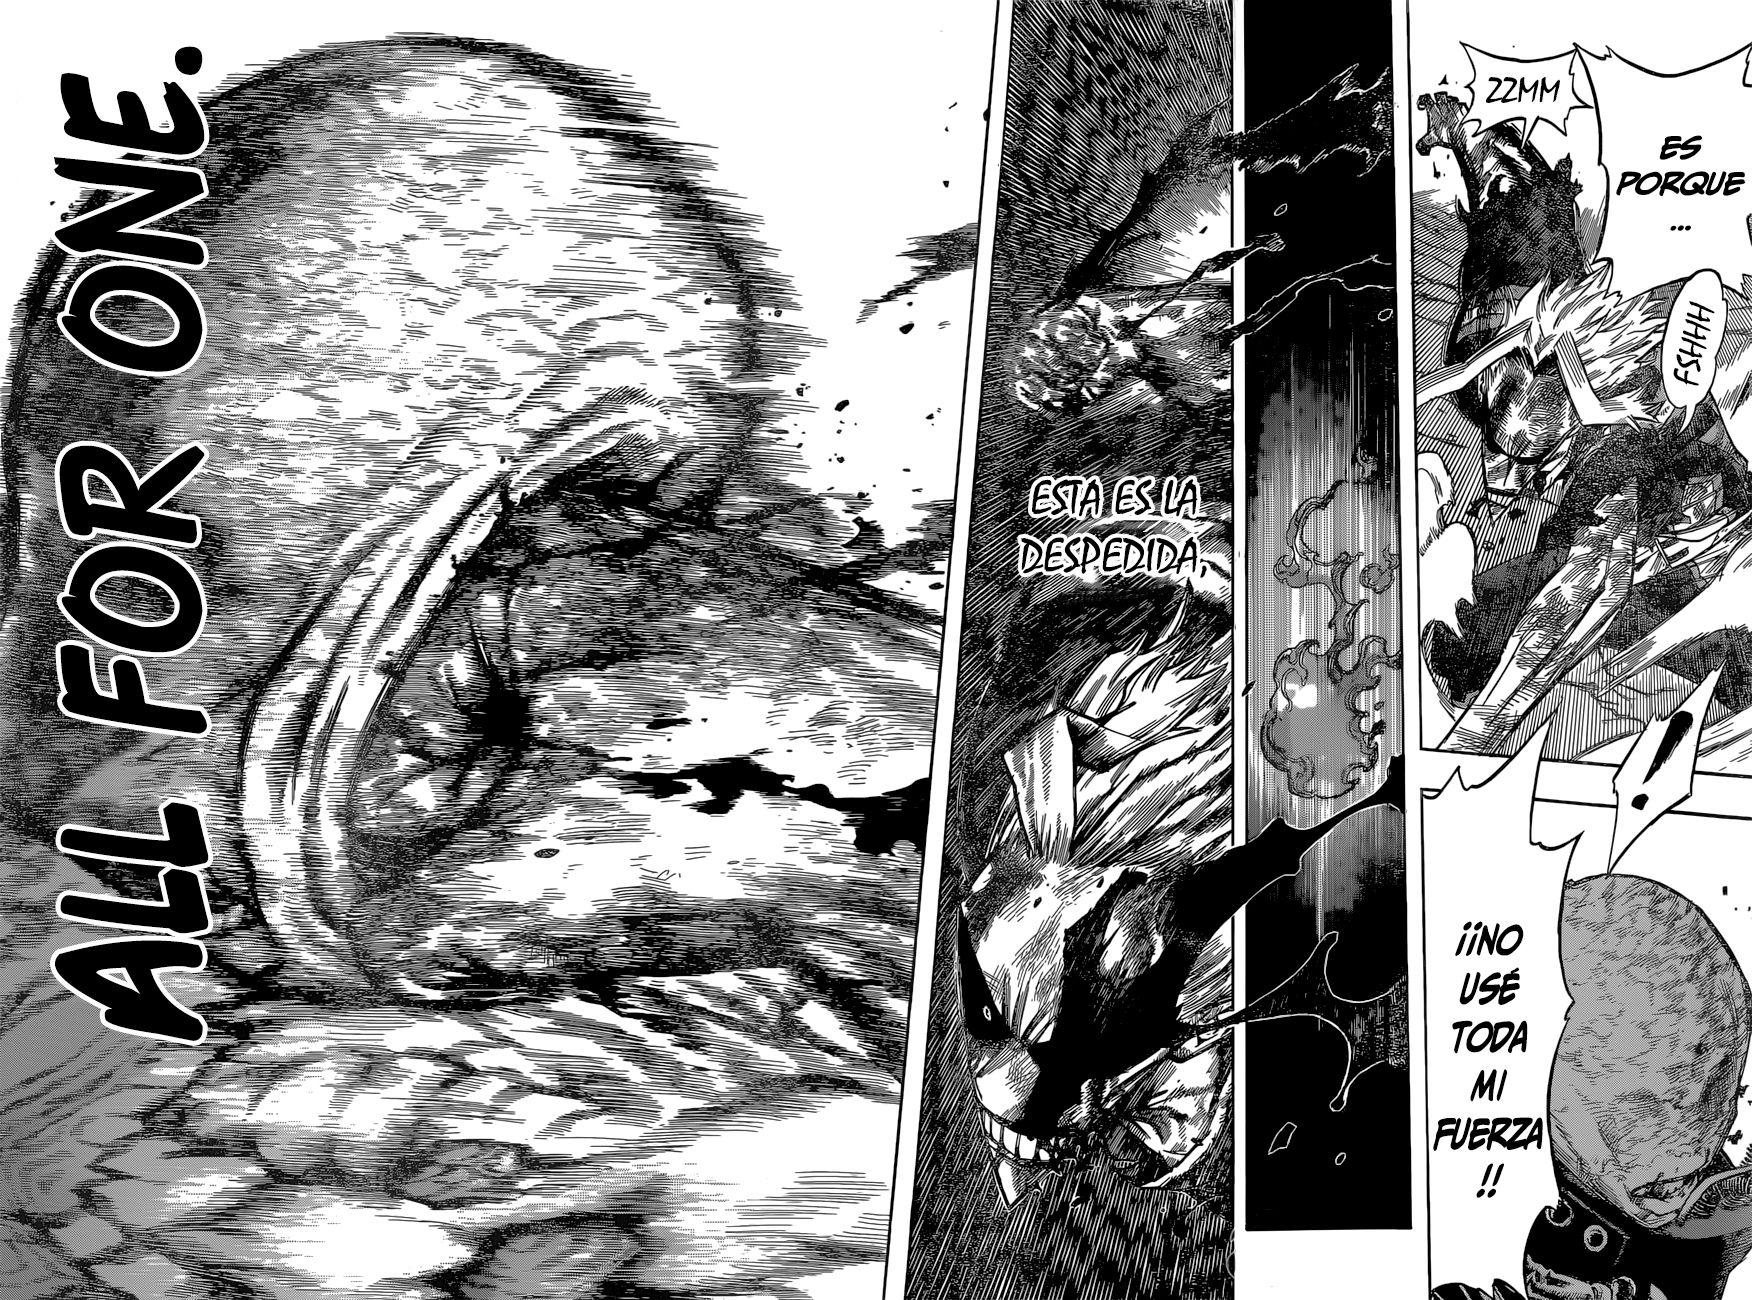 http://c5.ninemanga.com/es_manga/54/182/474247/29d0915ca23b701a291ba6dc35004289.jpg Page 5